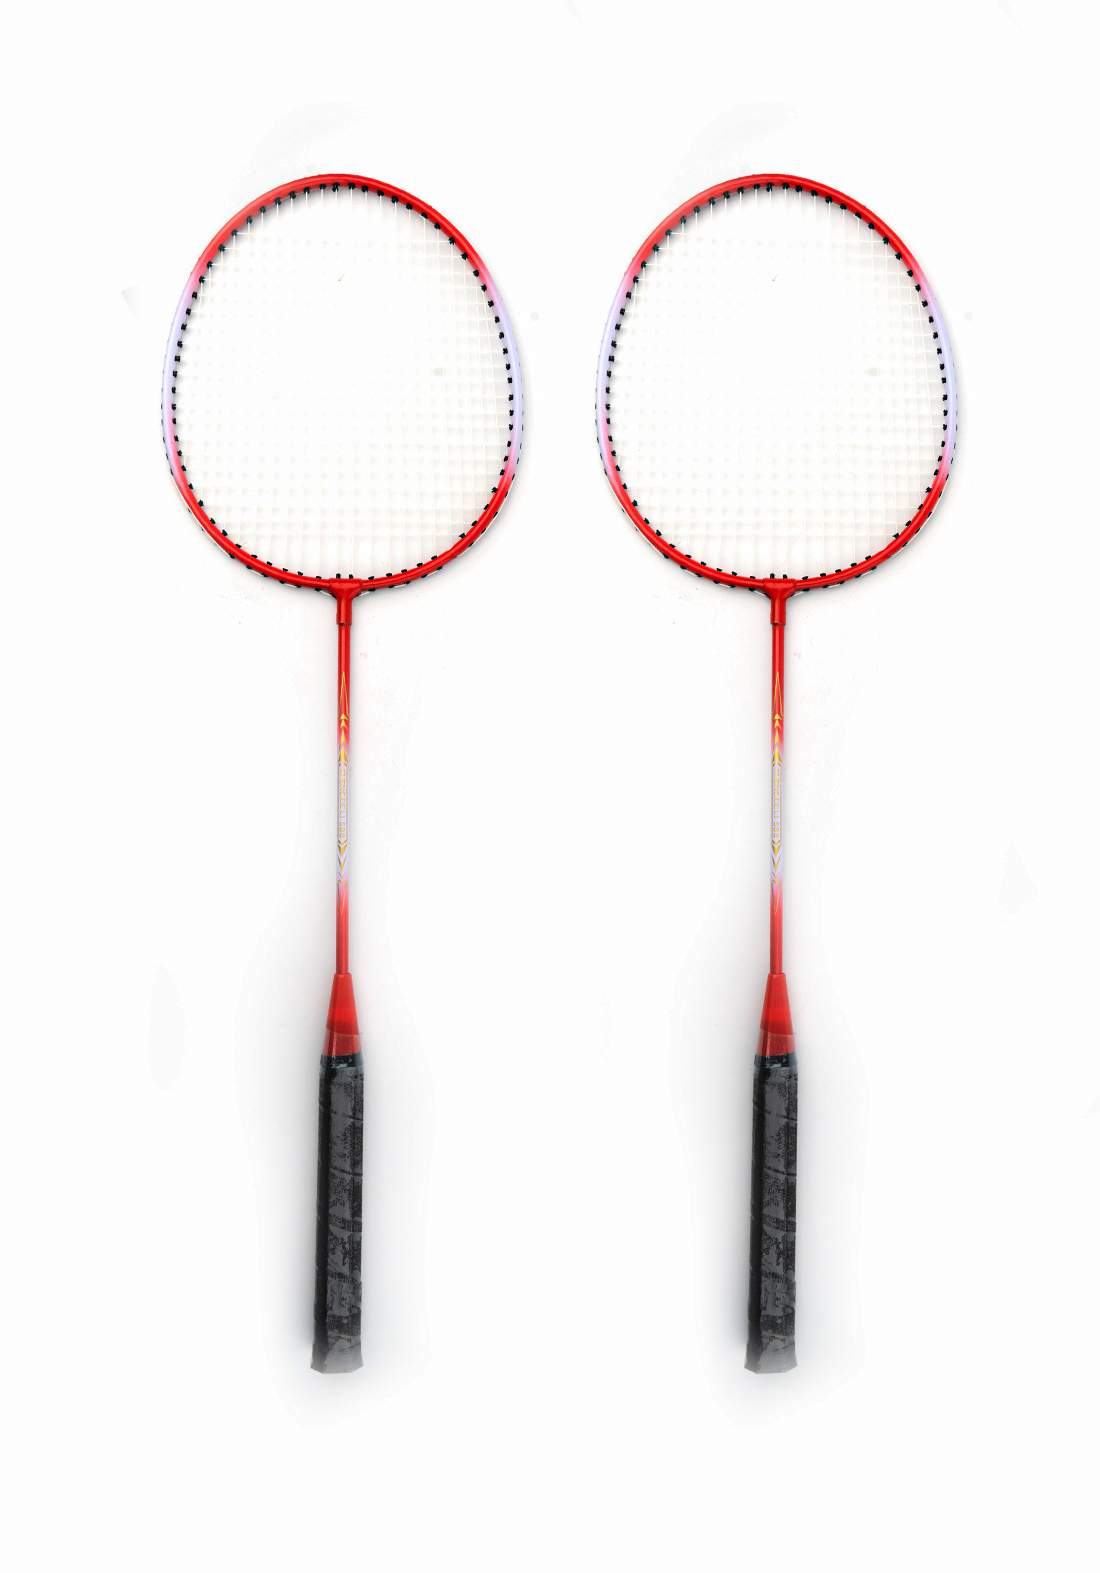 Badminton Racket  مضرب تنس